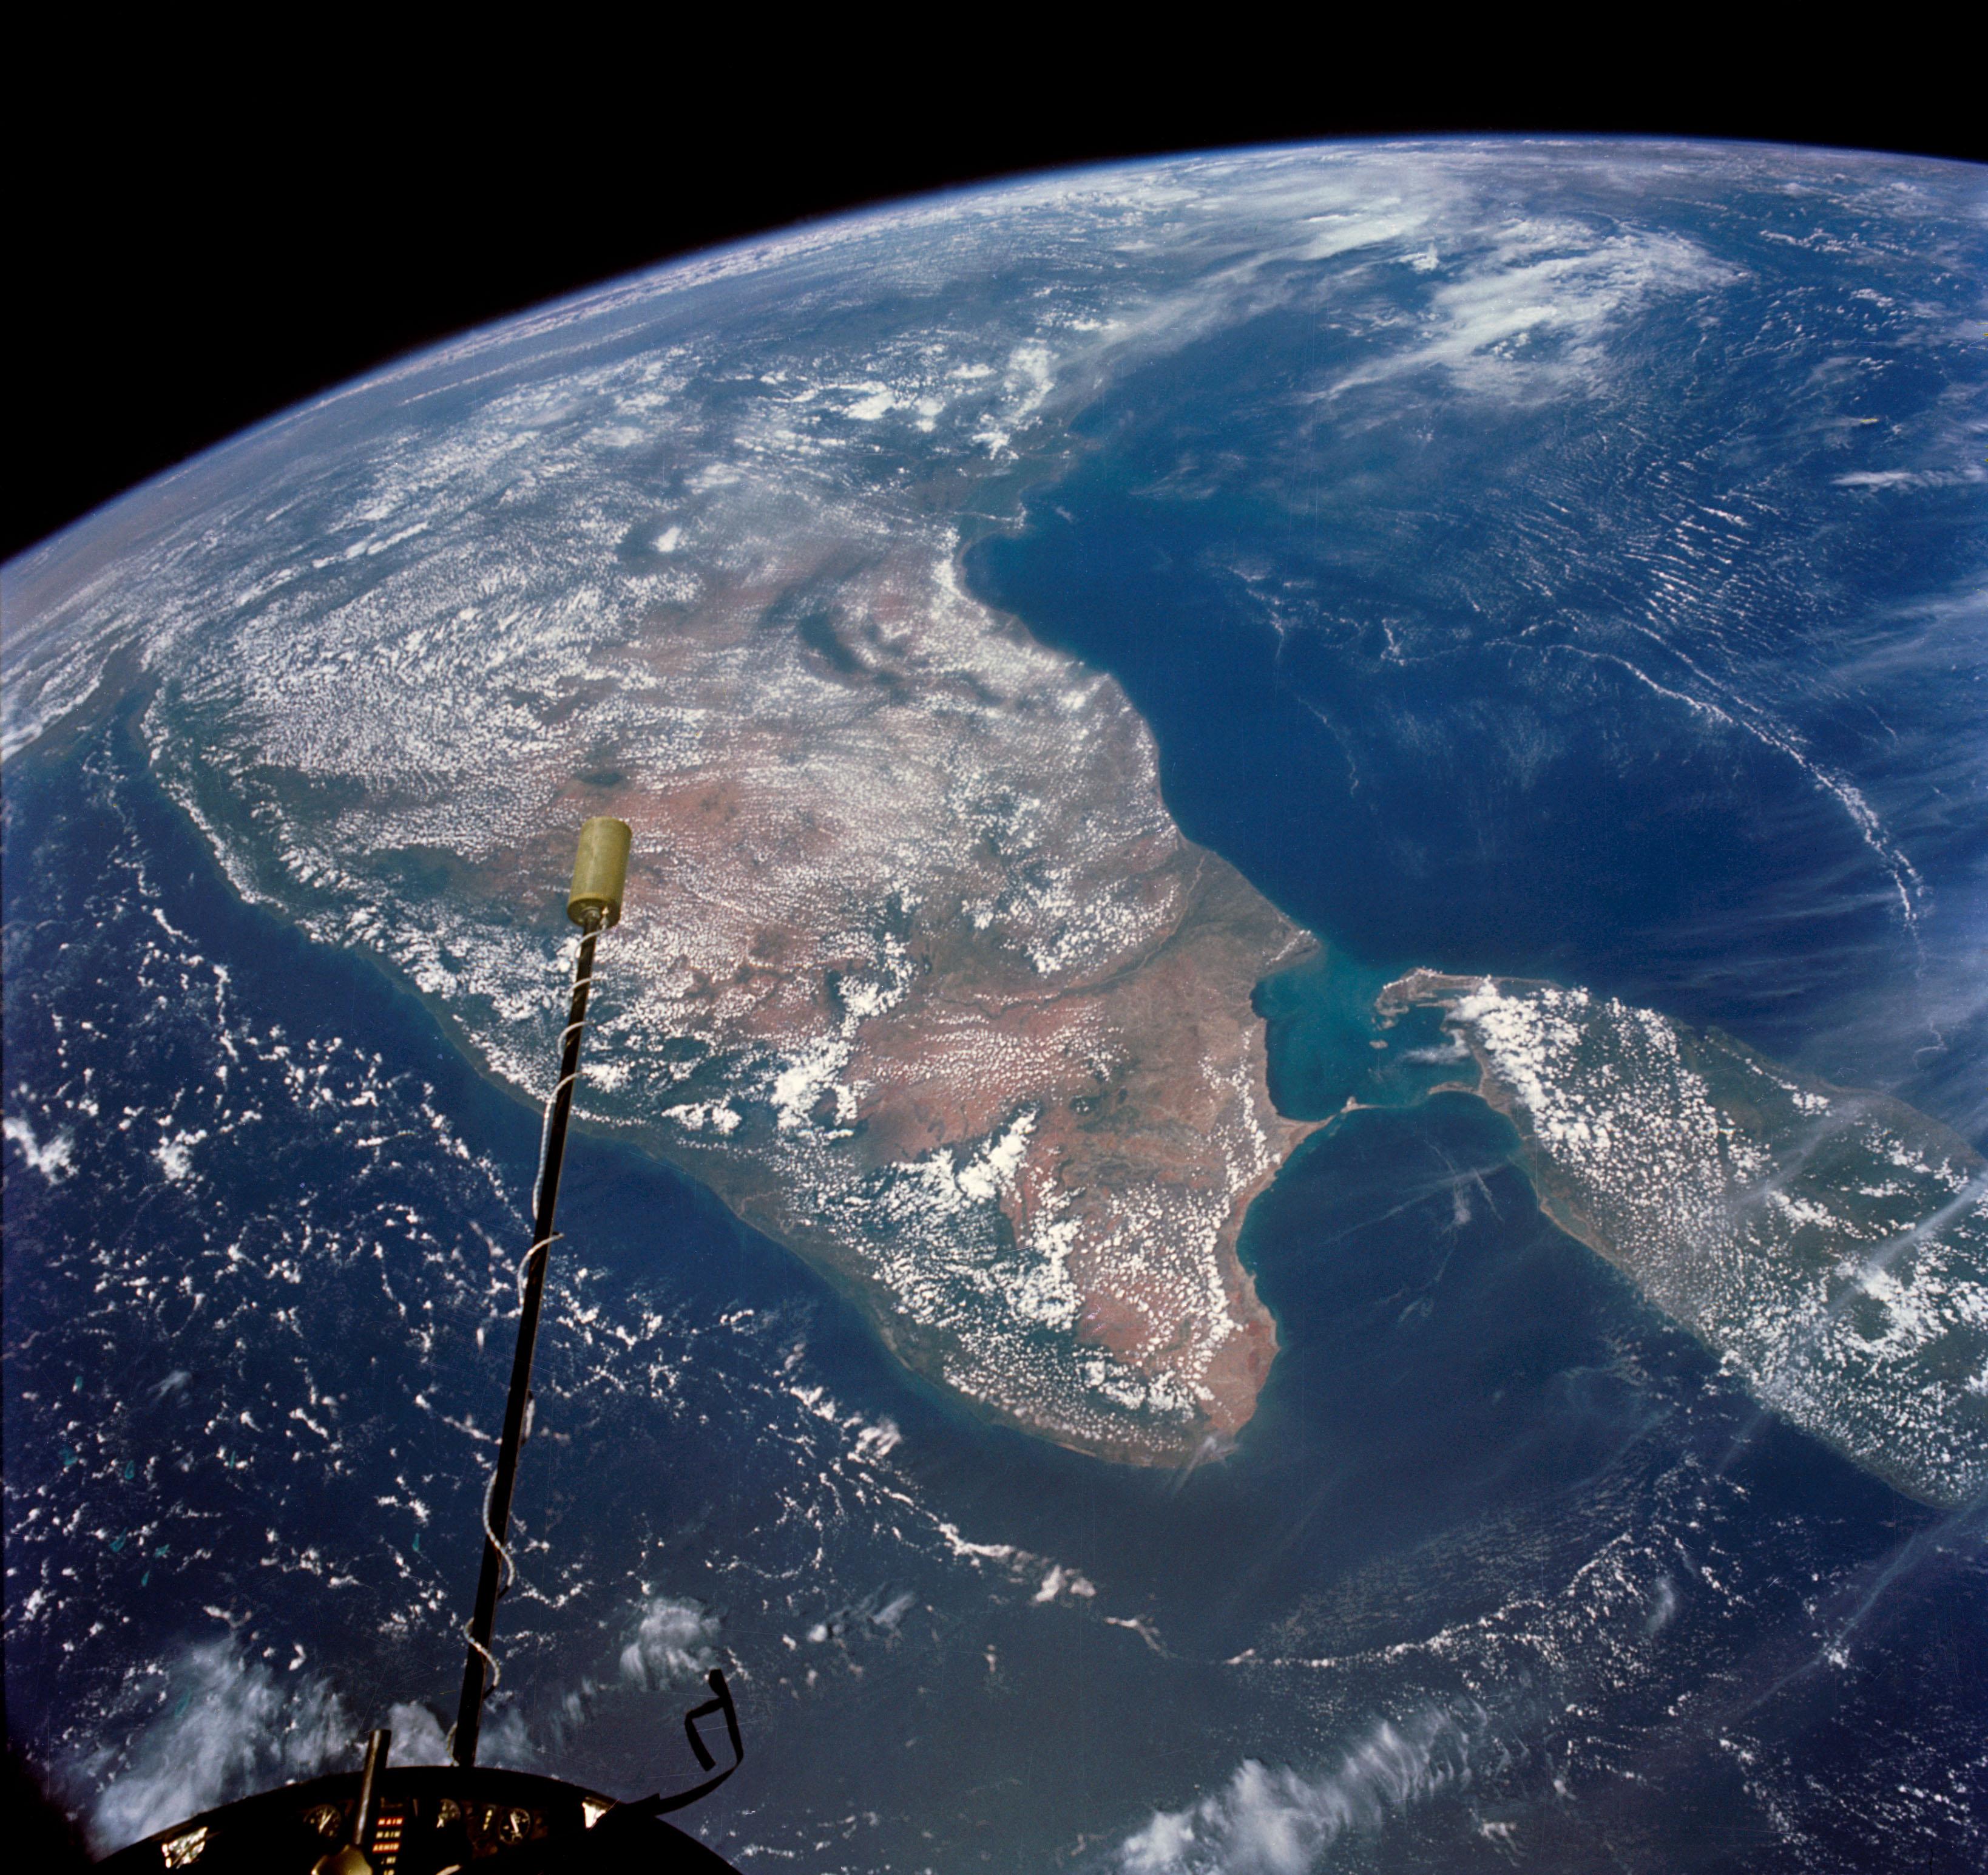 India_and_Ceylon_as_seen_from_the_orbiti